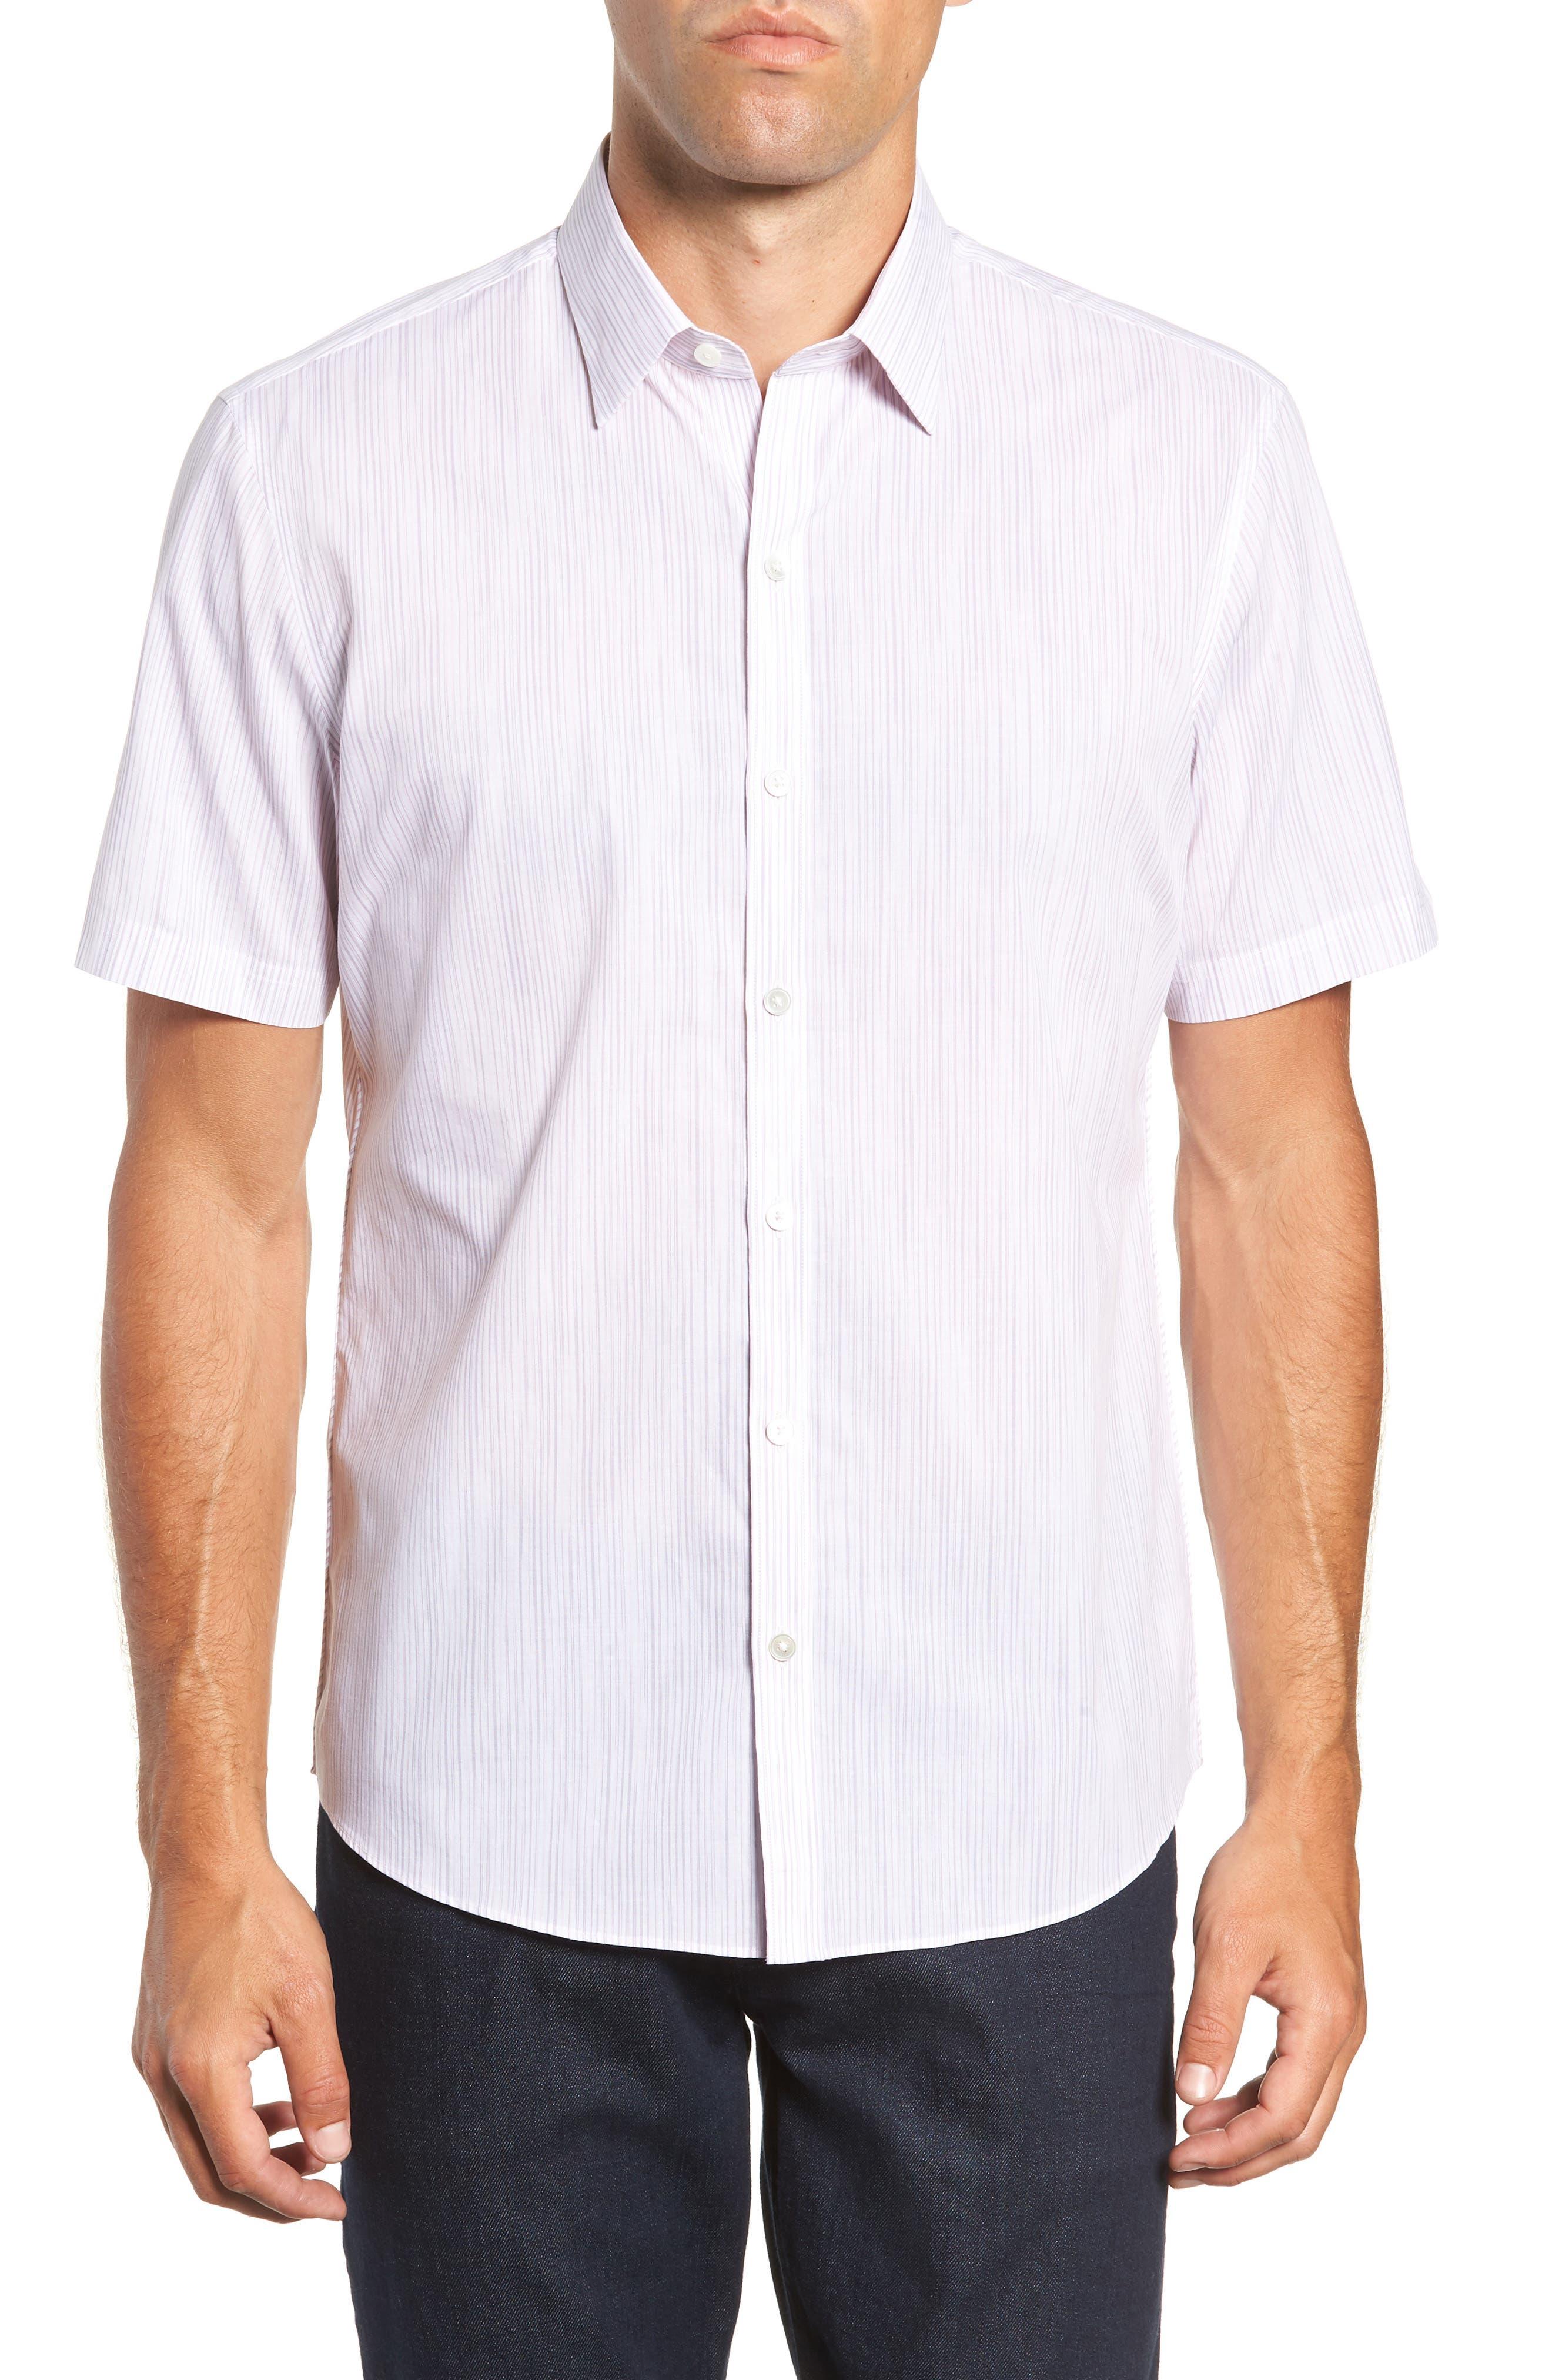 Bella Regular Fit Sport Shirt,                             Main thumbnail 1, color,                             LIGHT PINK